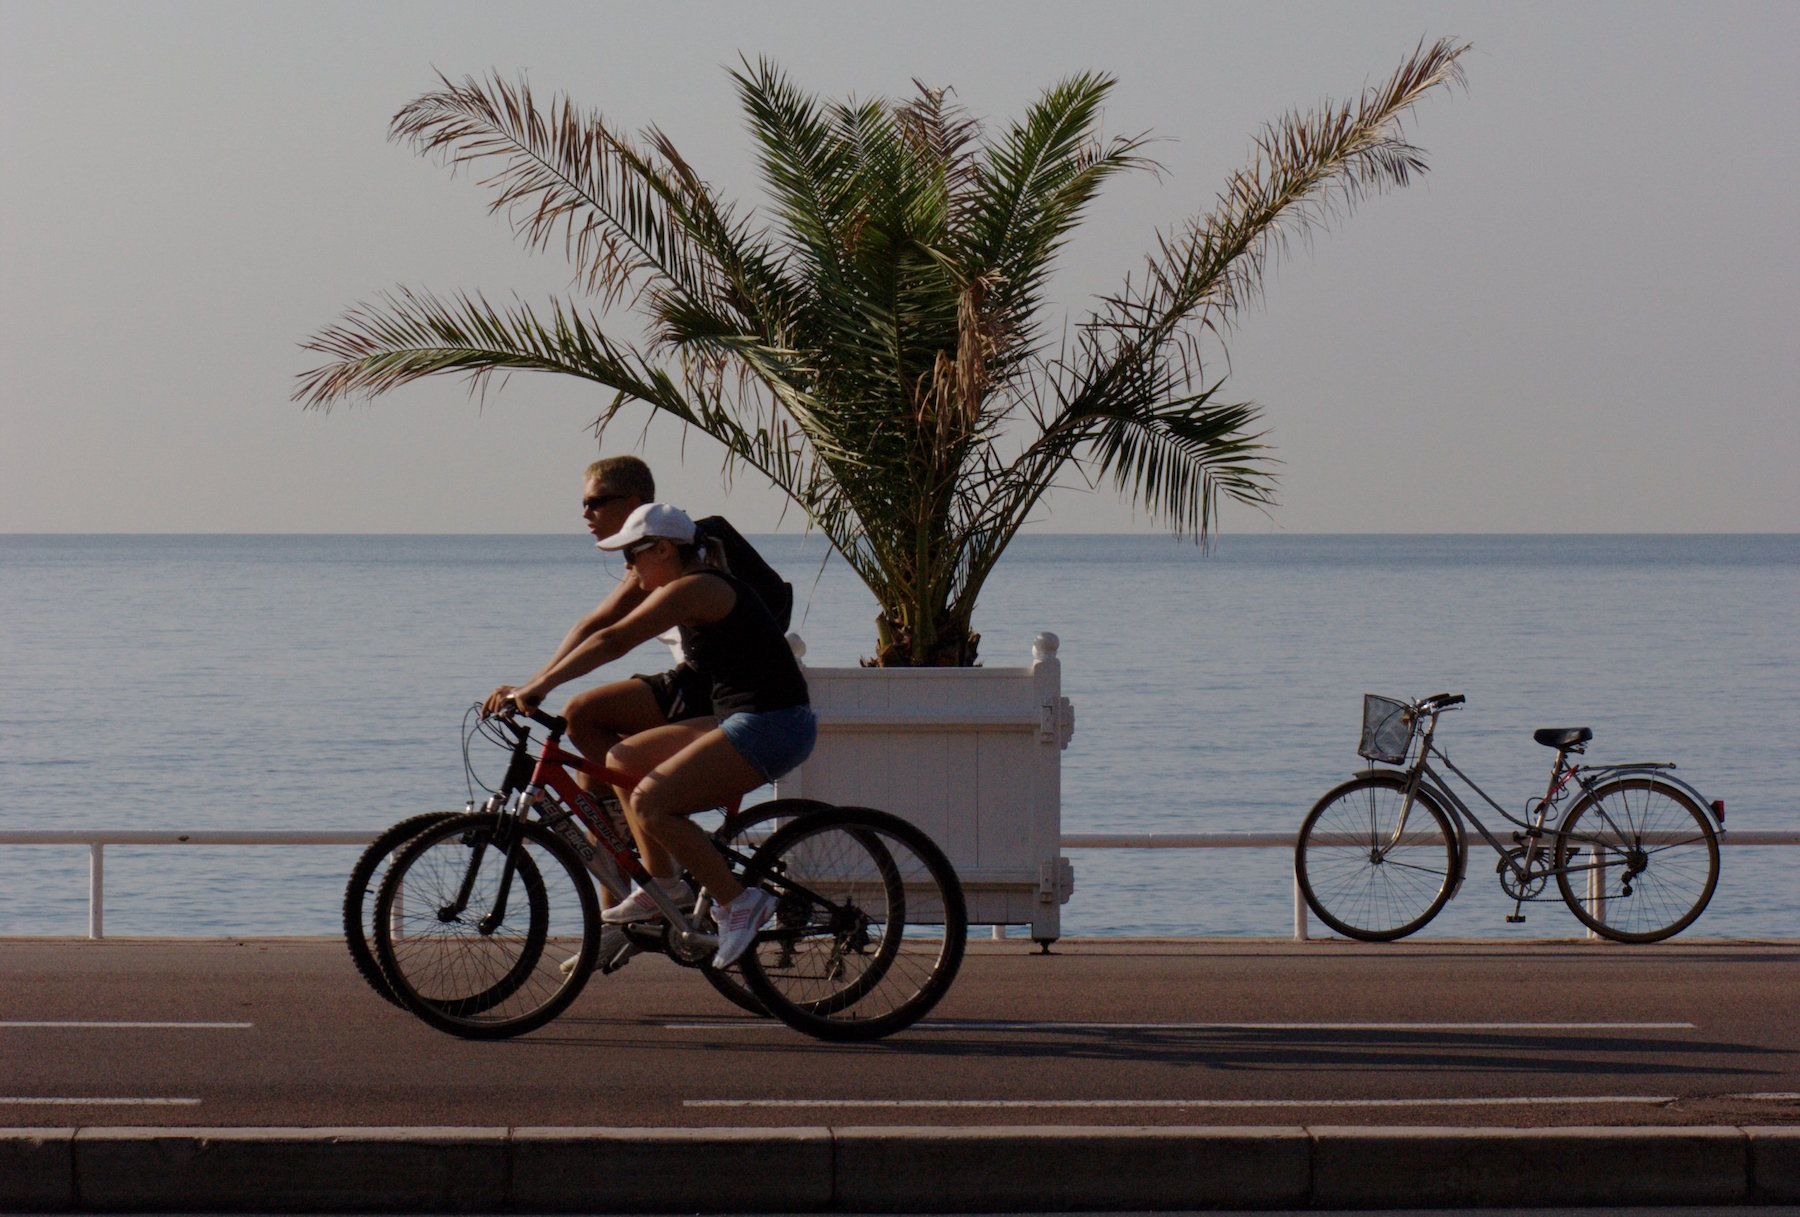 La carte des pistes cyclables de Nice